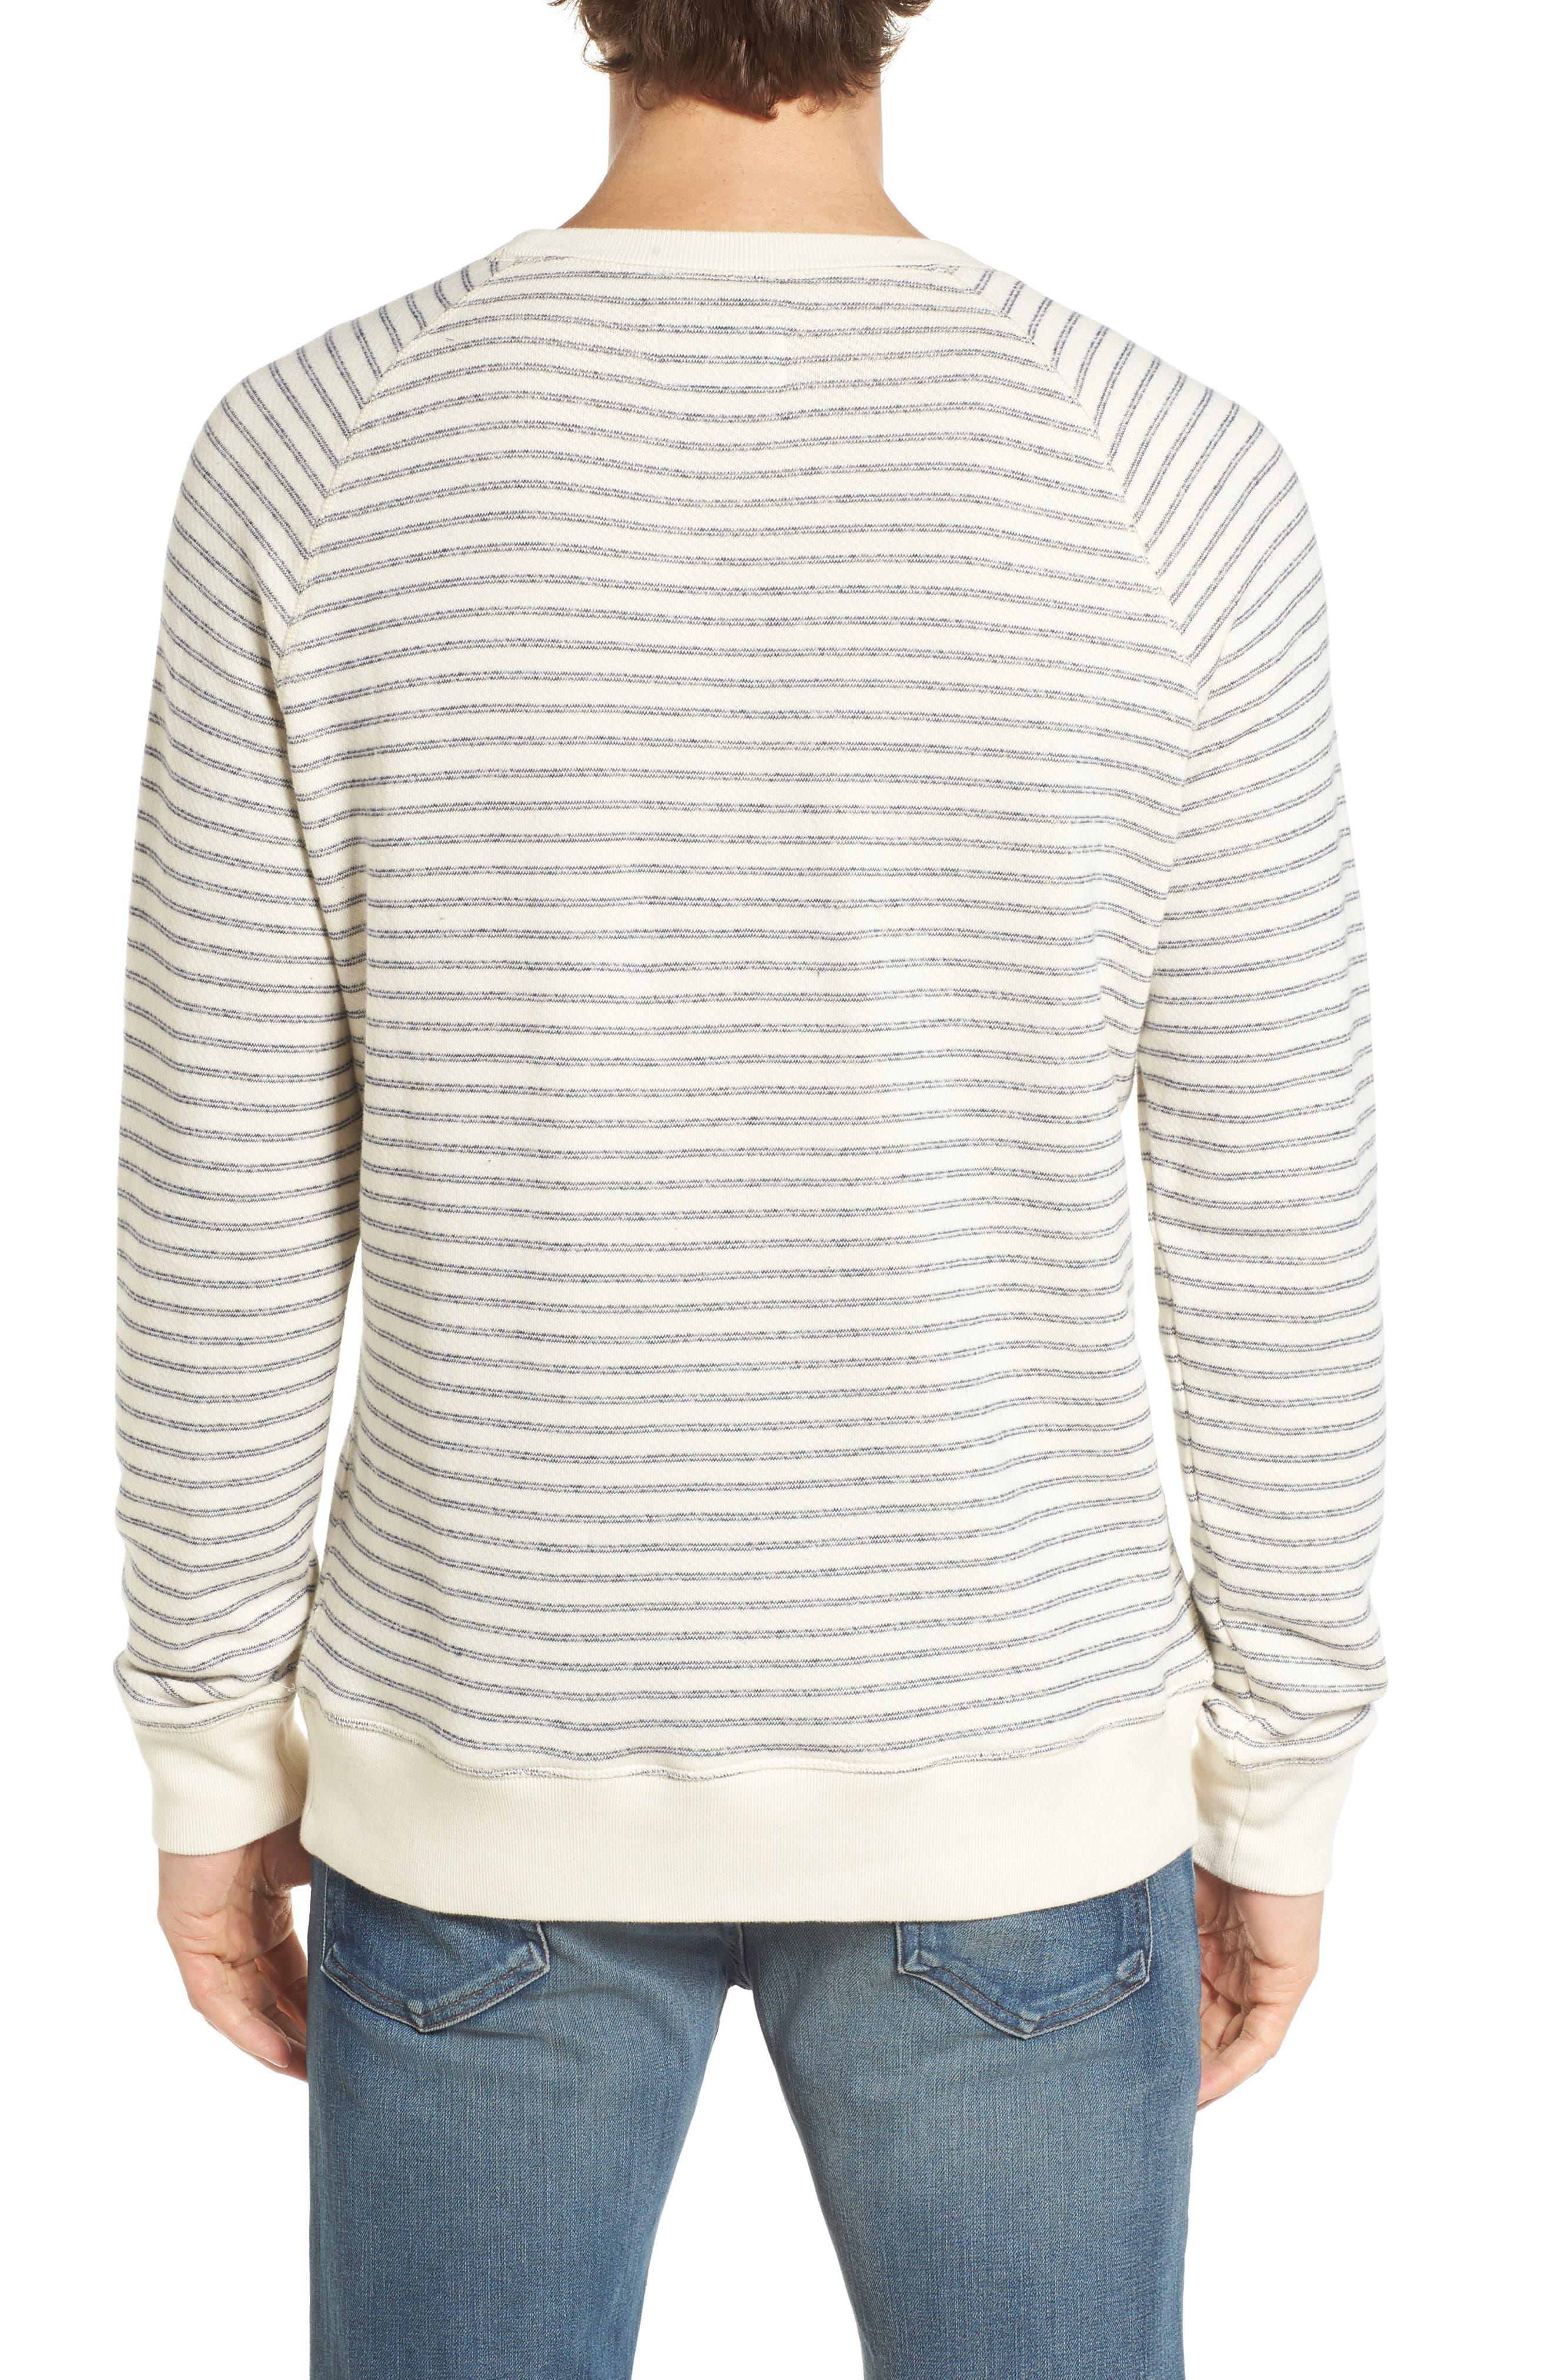 Dalton Stripe Terry Sweatshirt,                             Alternate thumbnail 2, color,                             White/ Navy Stripe